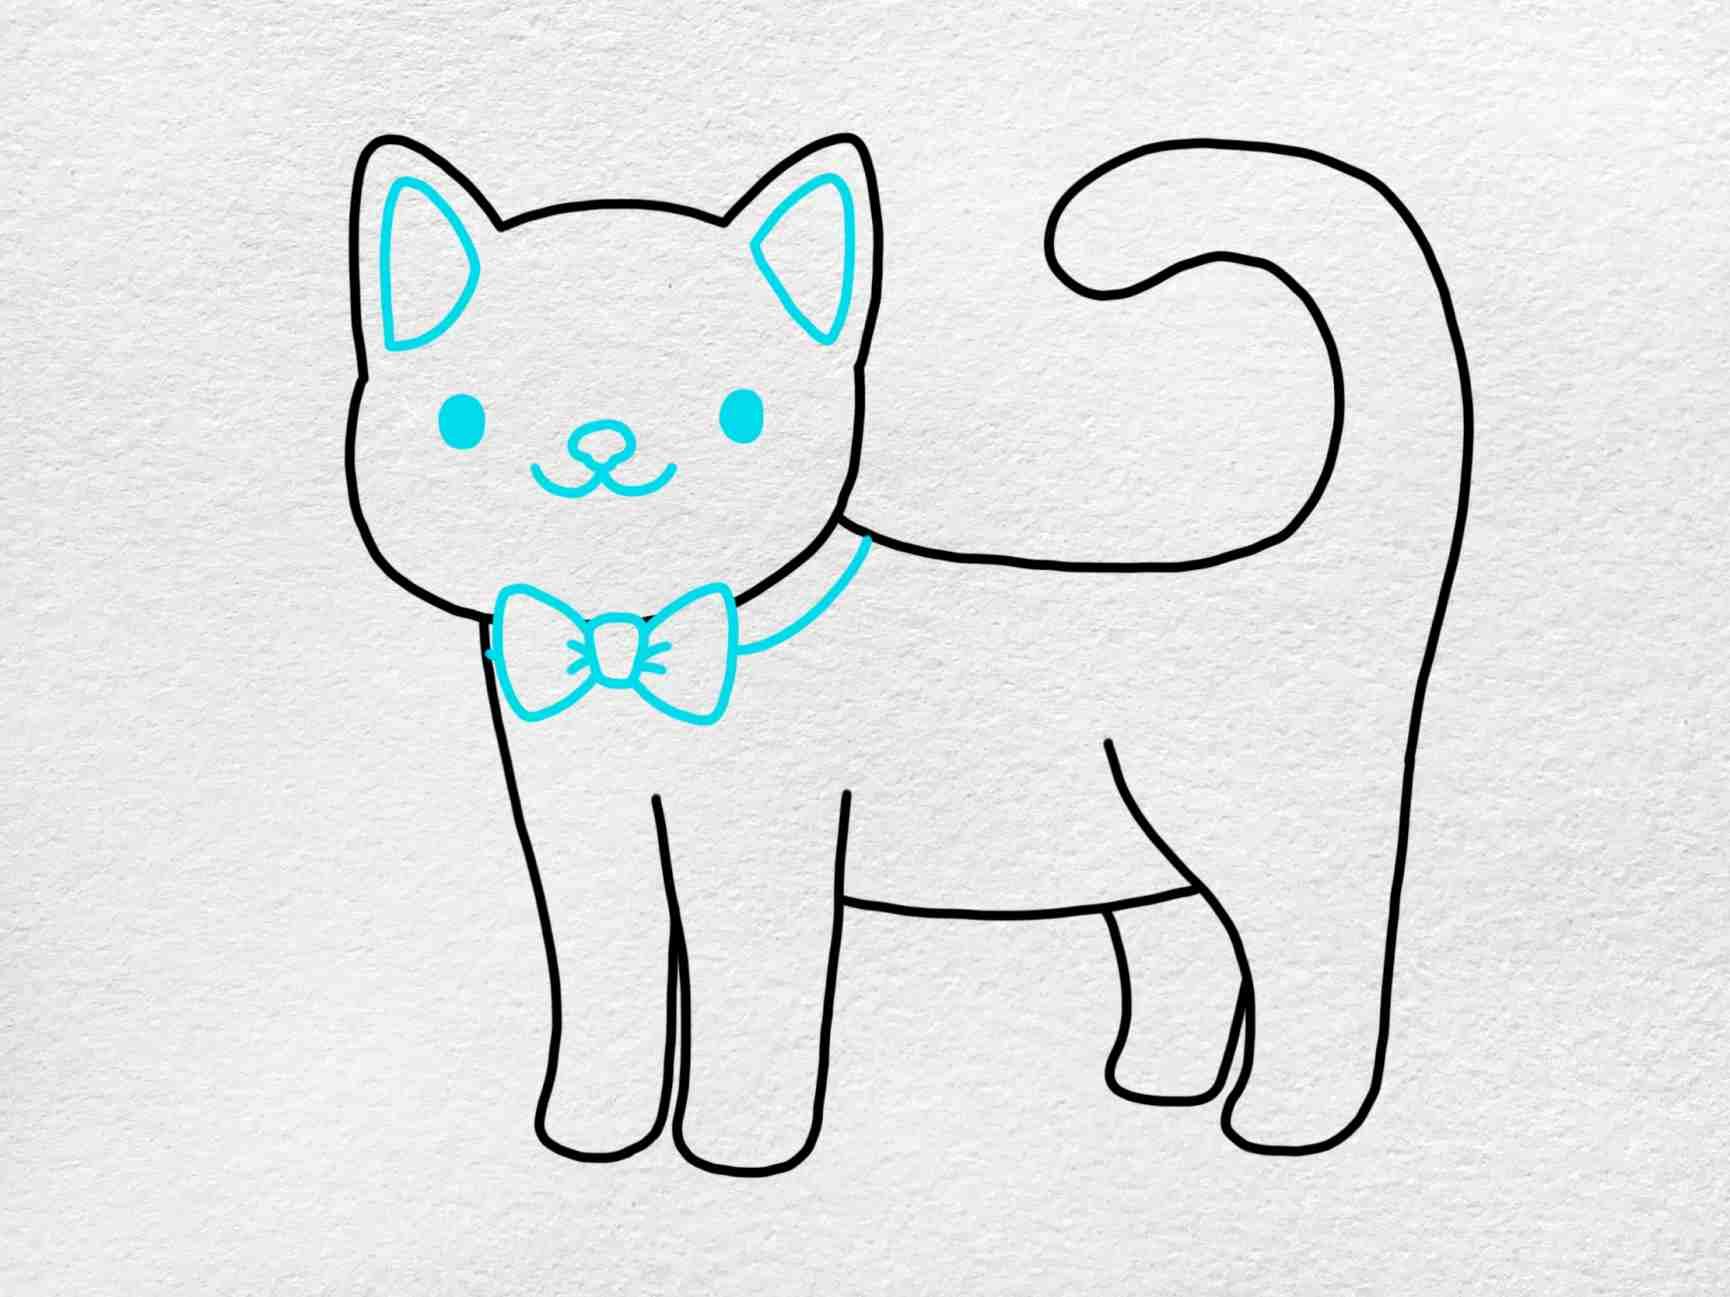 Cute Kitty Drawing: Step 4